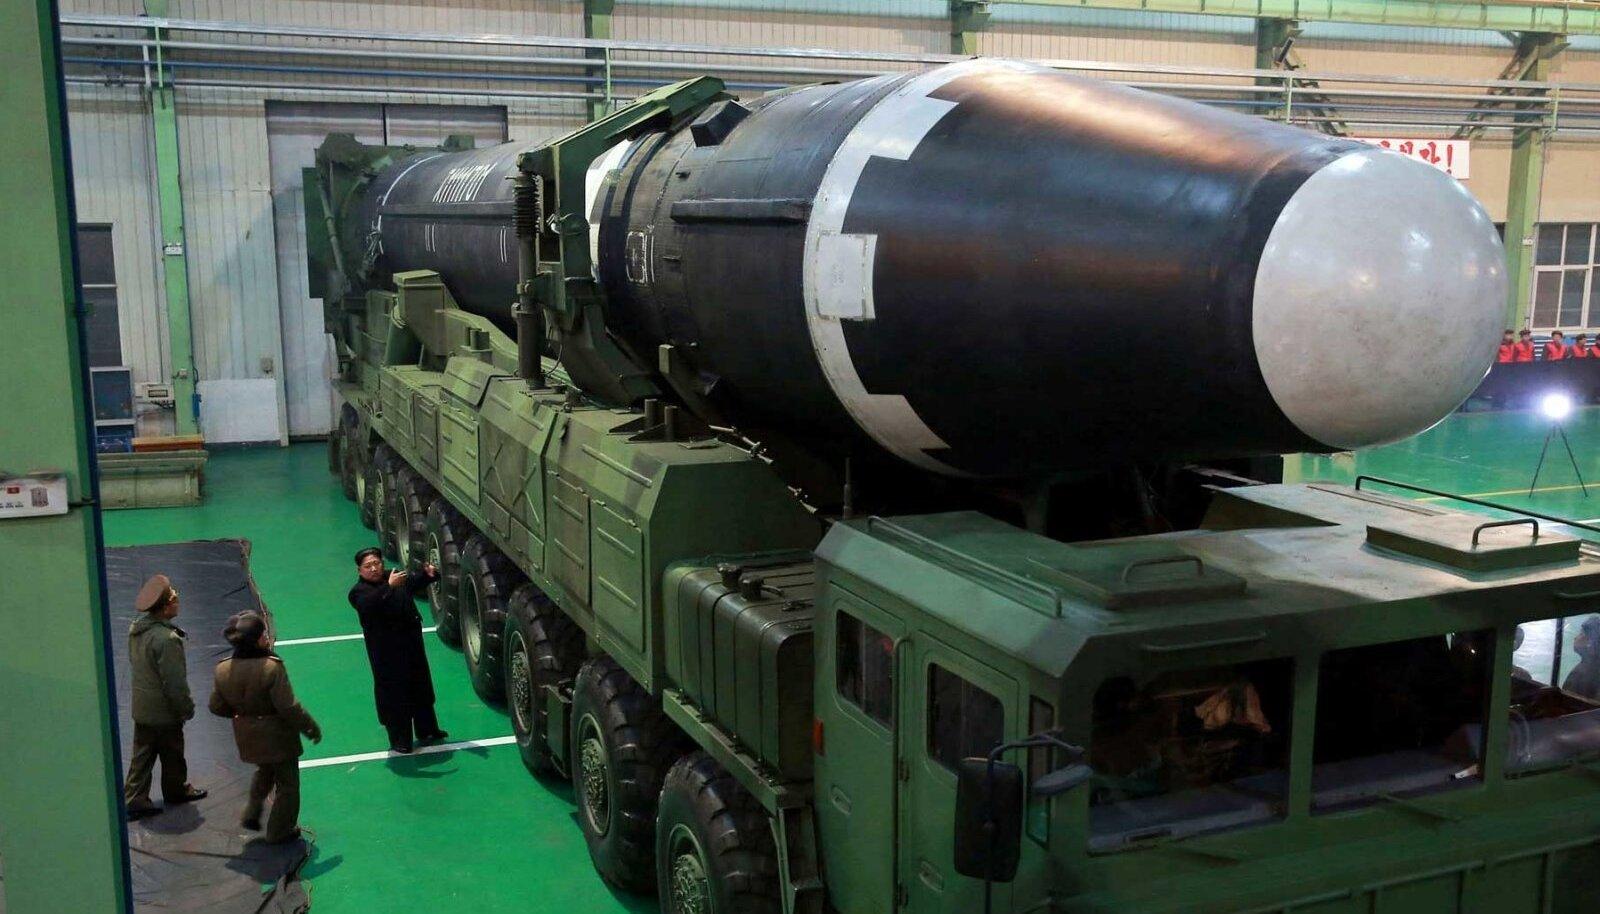 Põhja-Korea rakett Hwasong-15